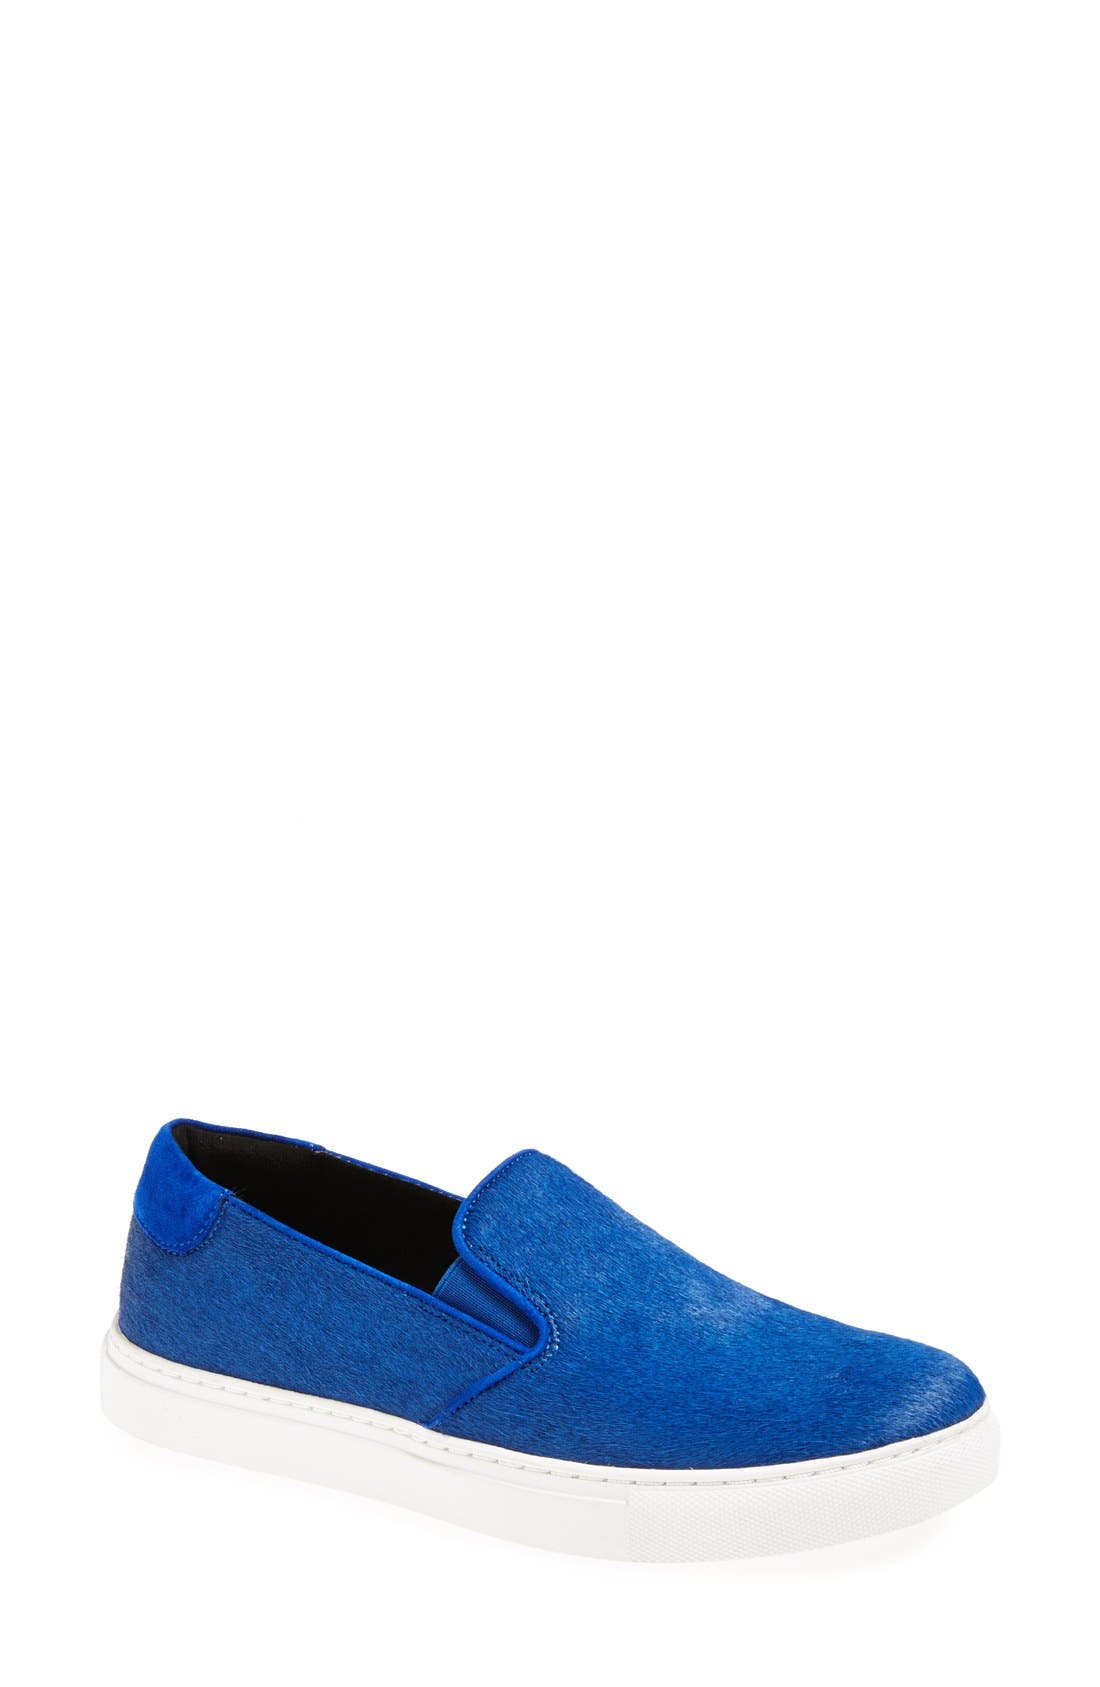 Kenneth Cole New York 'King' Calf Hair Sneaker